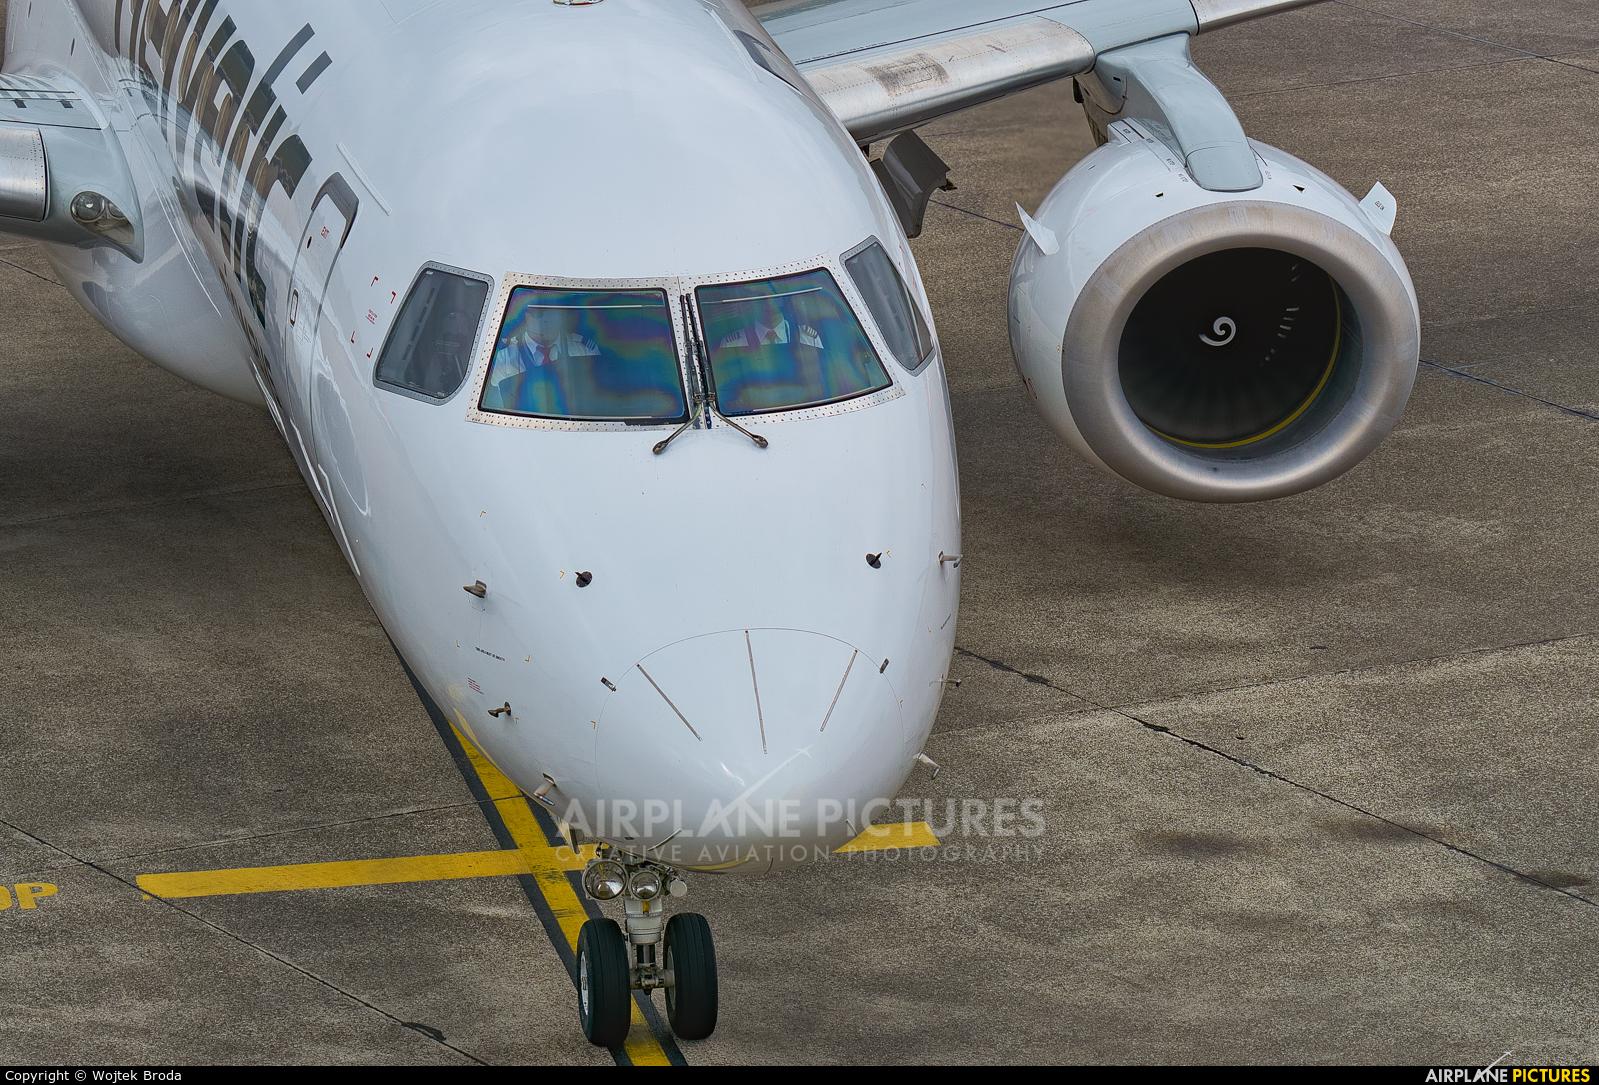 Helvetic Airways HB-JVT aircraft at Berlin - Tegel